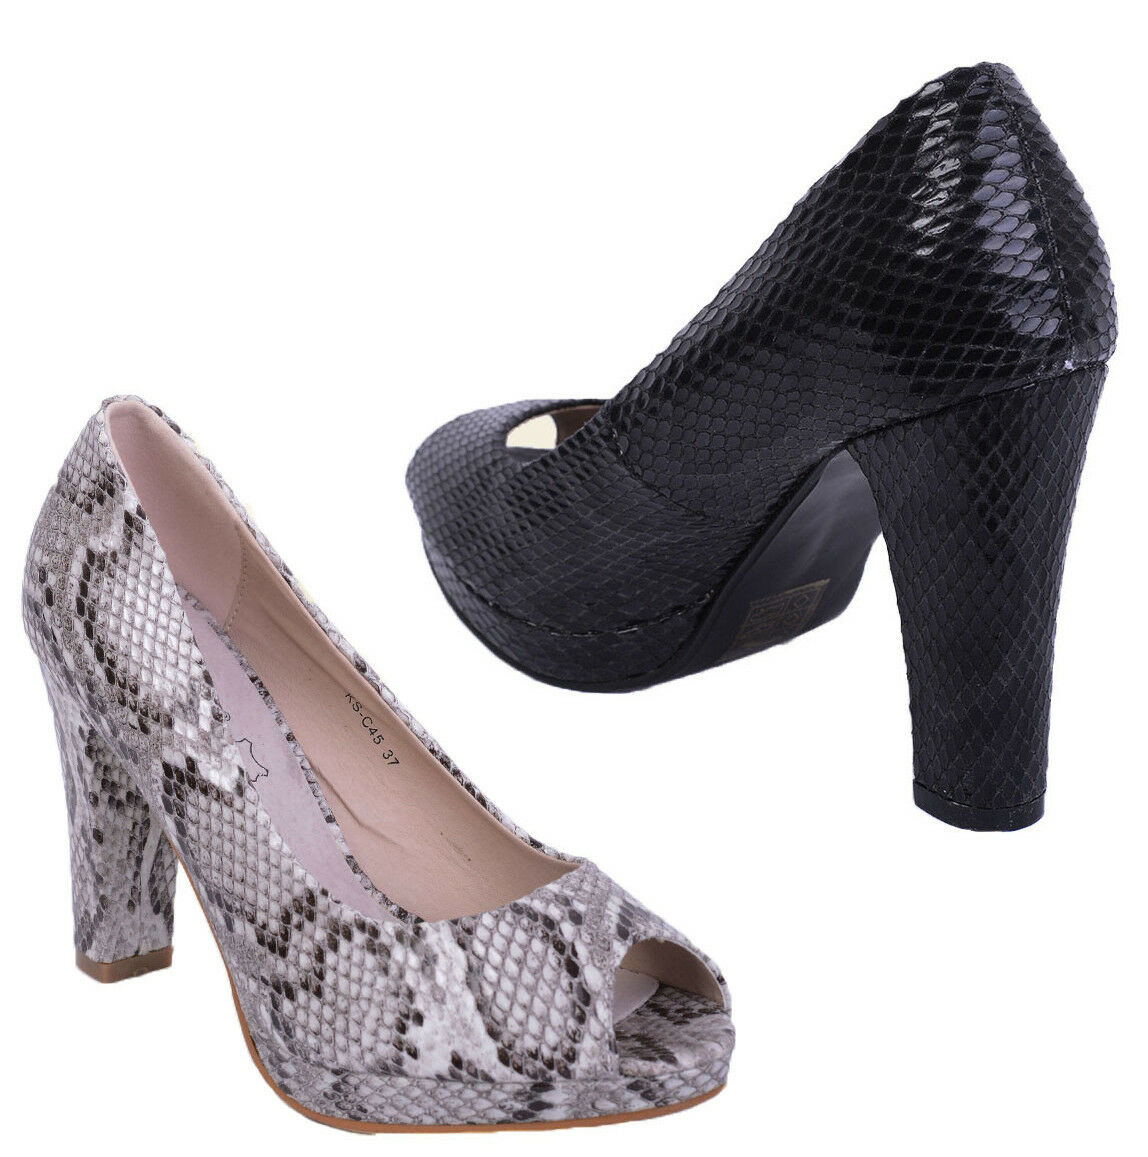 S37 - Ladies High Snakeskin Peep Toe Block High Ladies Heel Evening Court Shoes - 639c9e